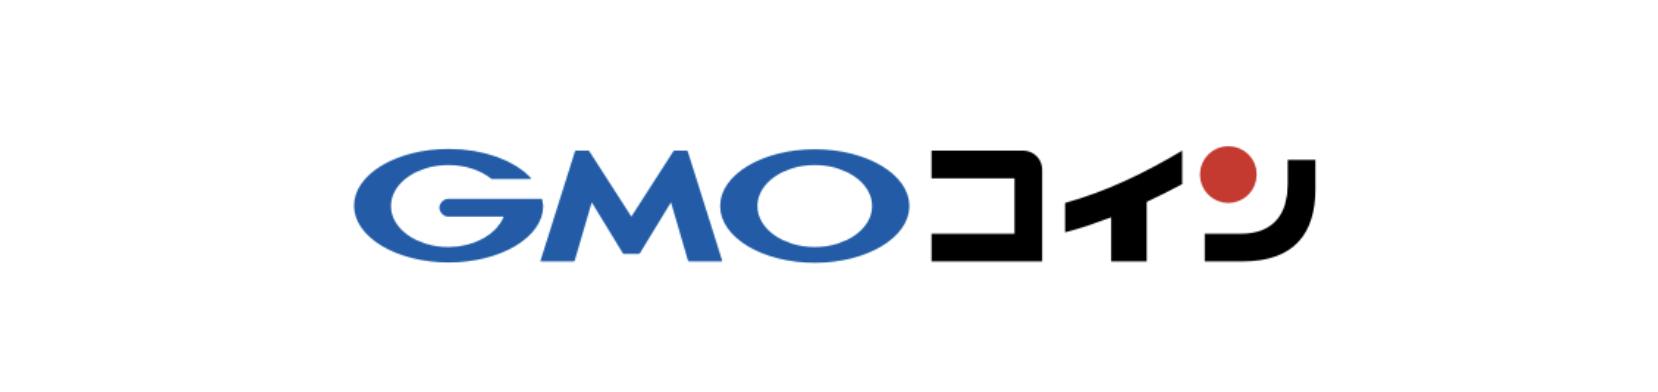 GMOが日本円ペッグ通貨「GMO Japanese YEN(GJY)」を来年発行予定!